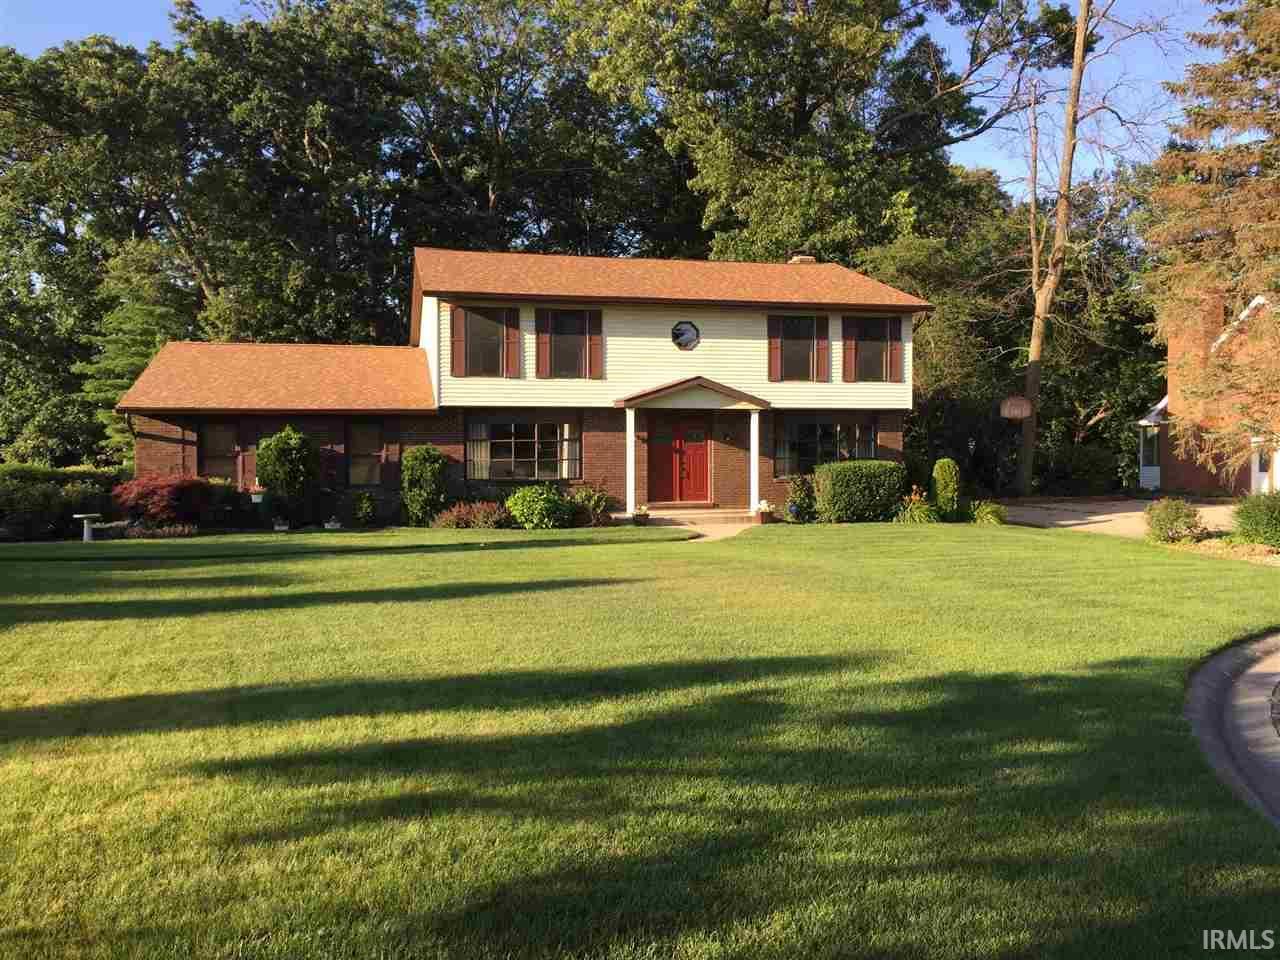 17131 Ridgefield, Granger, IN 46530